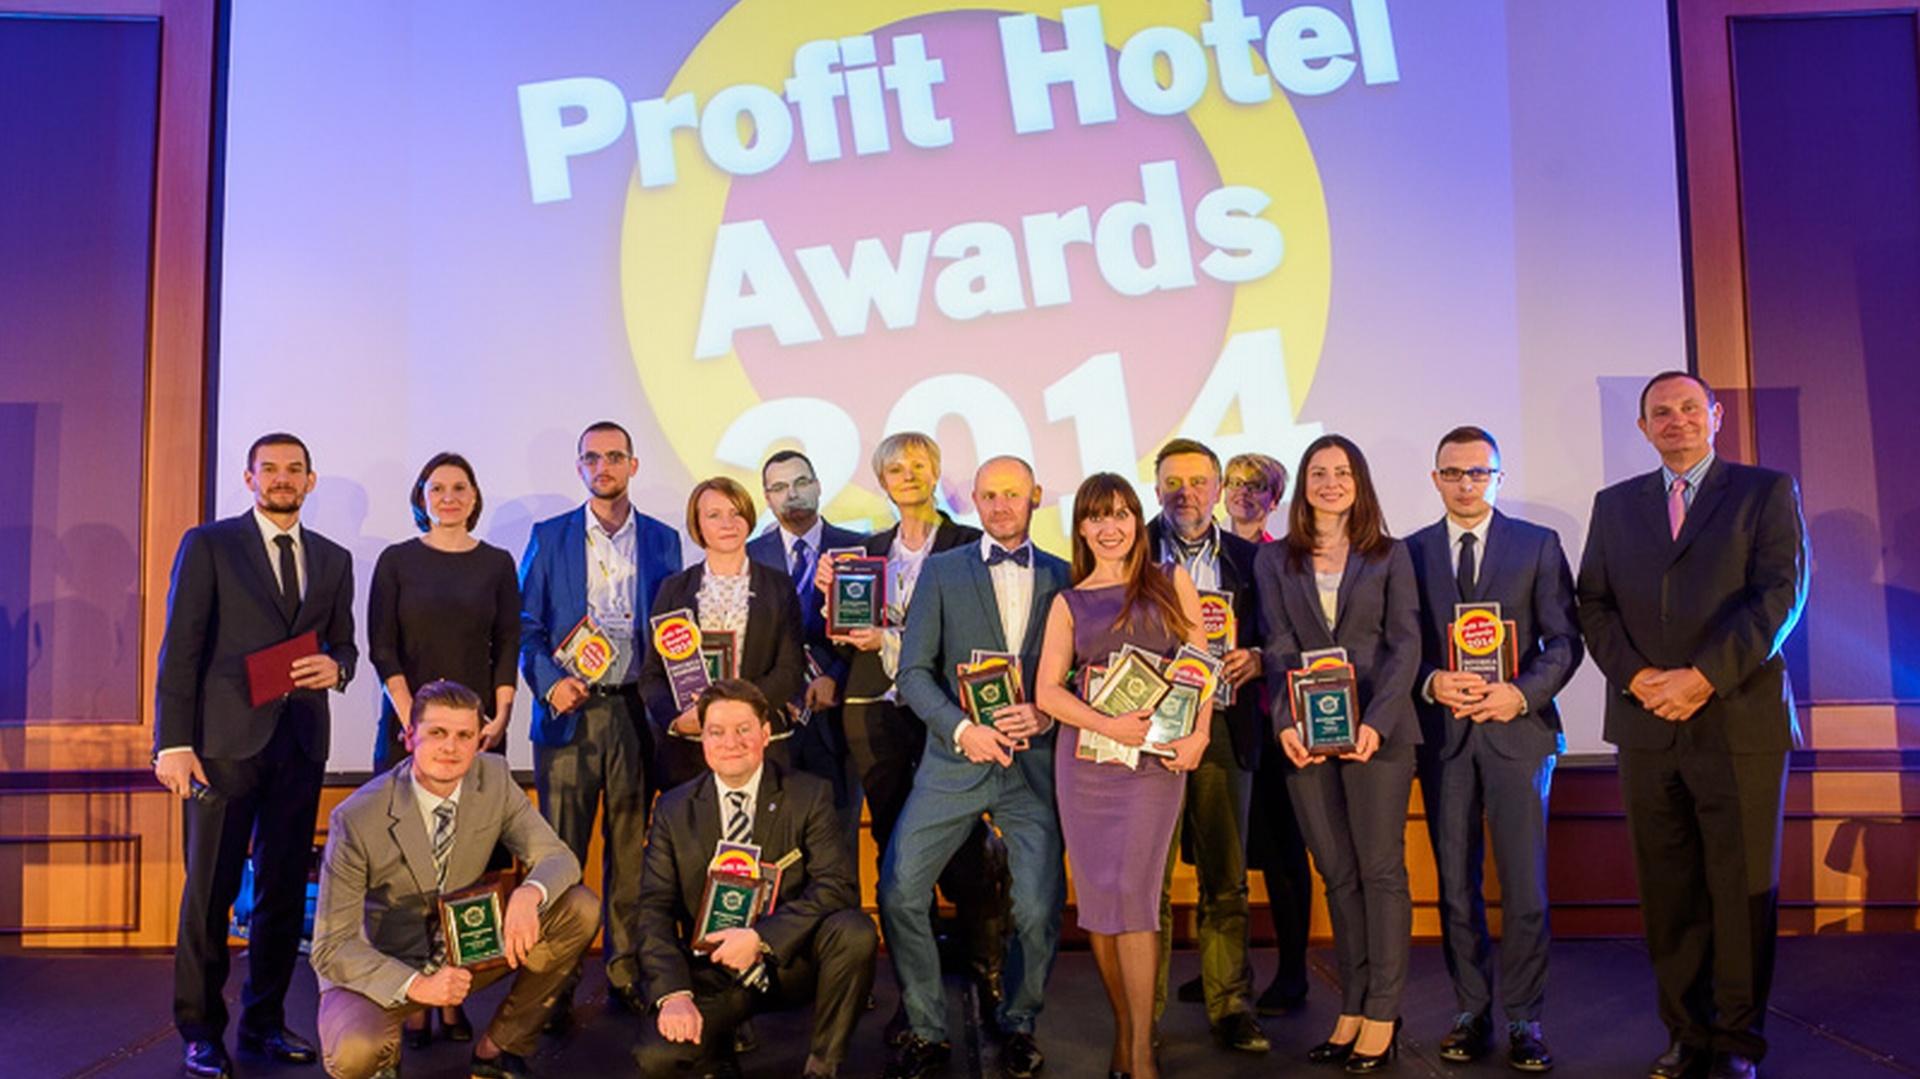 finaliści Perofi Hotel Awards 2014.jpg